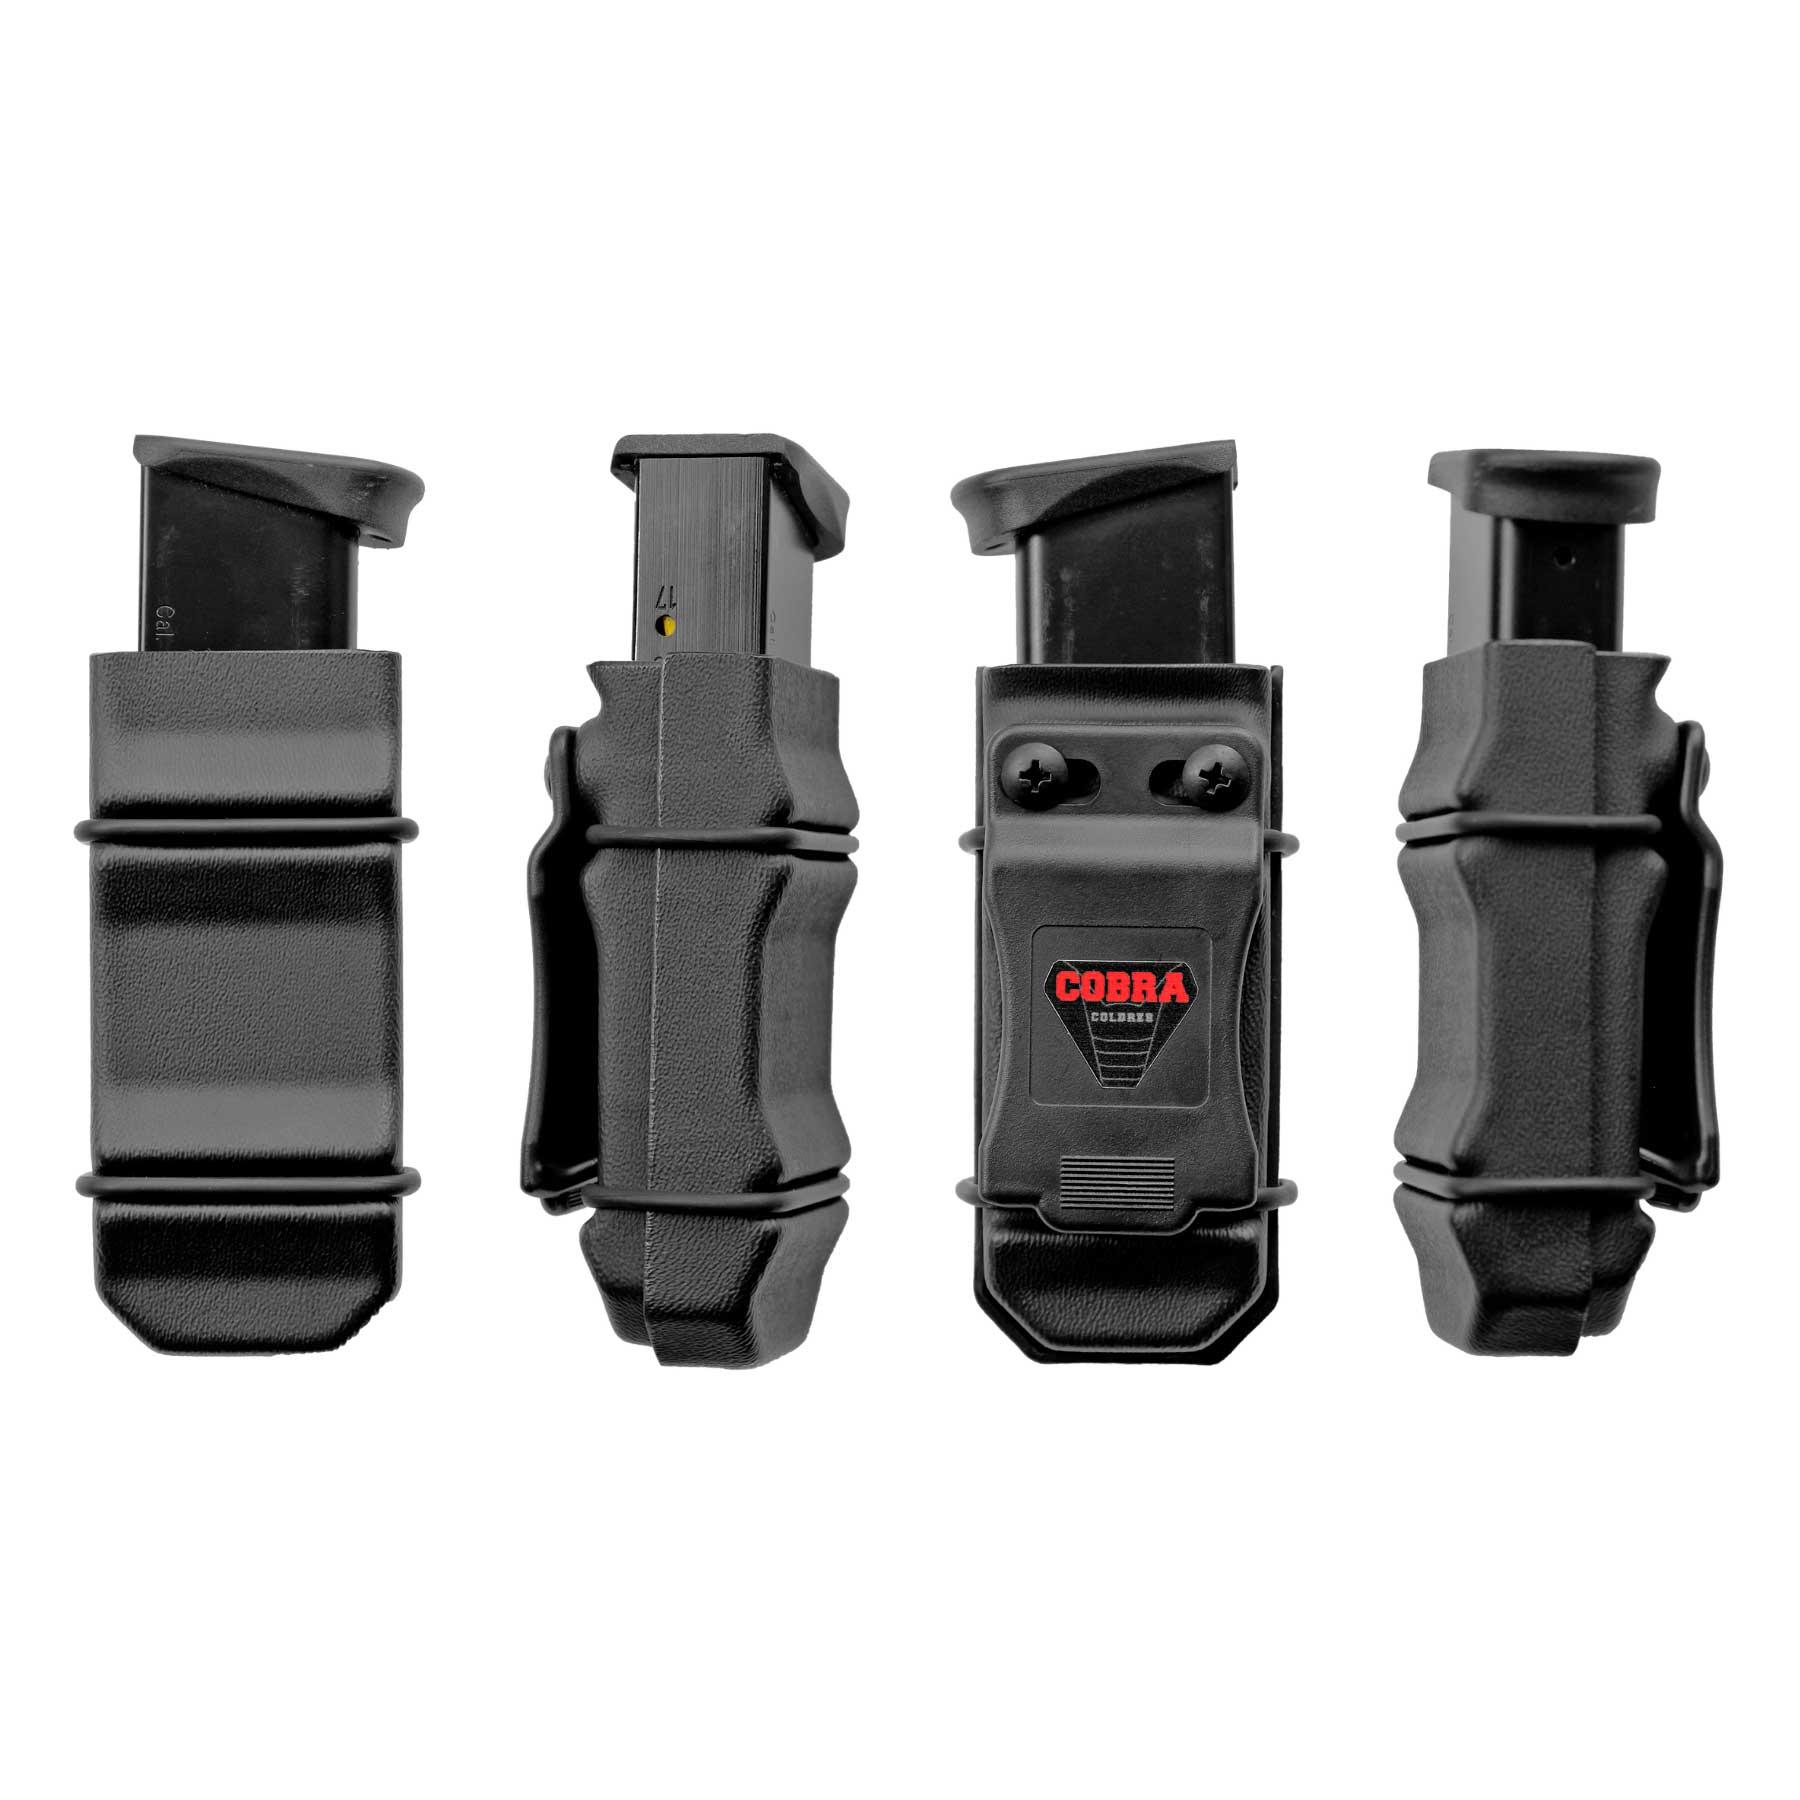 Coldre Glock [G26] [G27] [G28] [G33] Kydex + 1 Porta-Carregador Universal - Saque Rápido Velado Kydex® 080